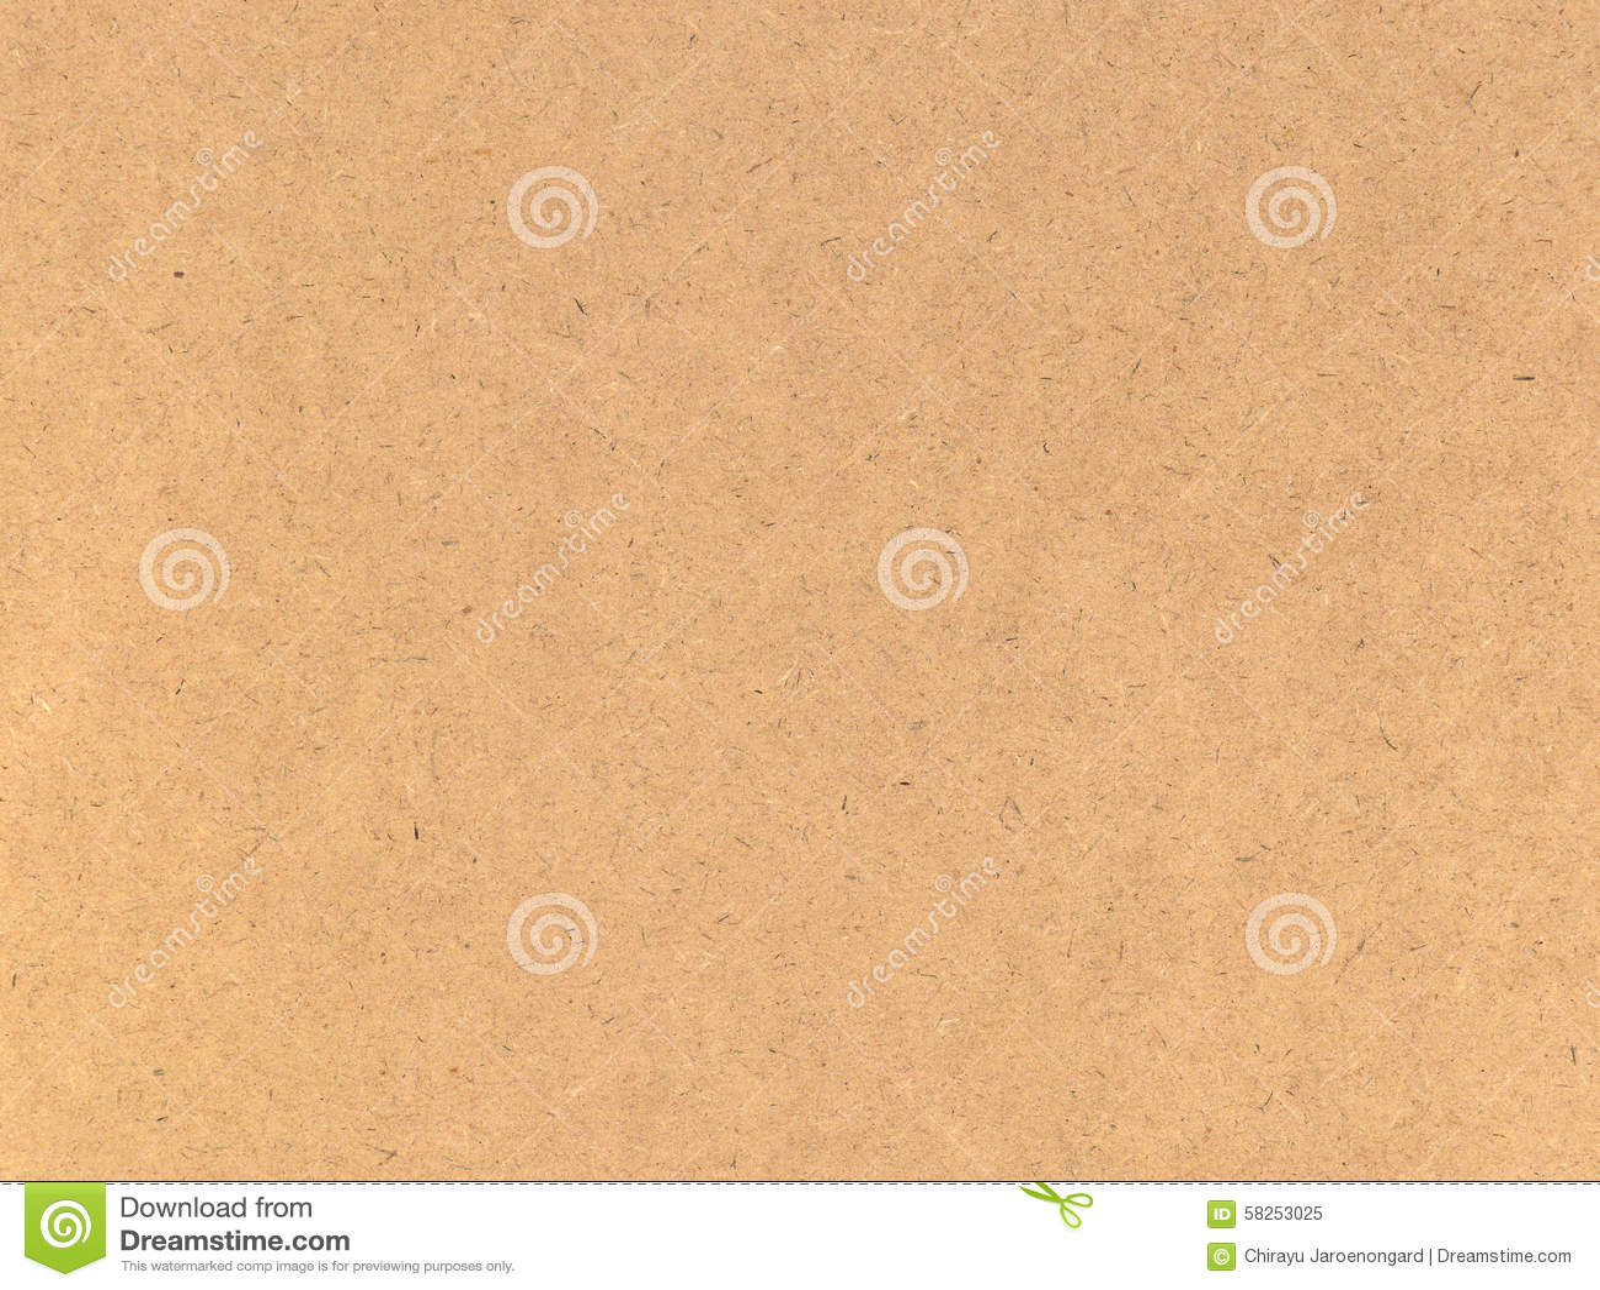 Papier texture stock image. Image of sheet, paper, wallpaper - 58253025